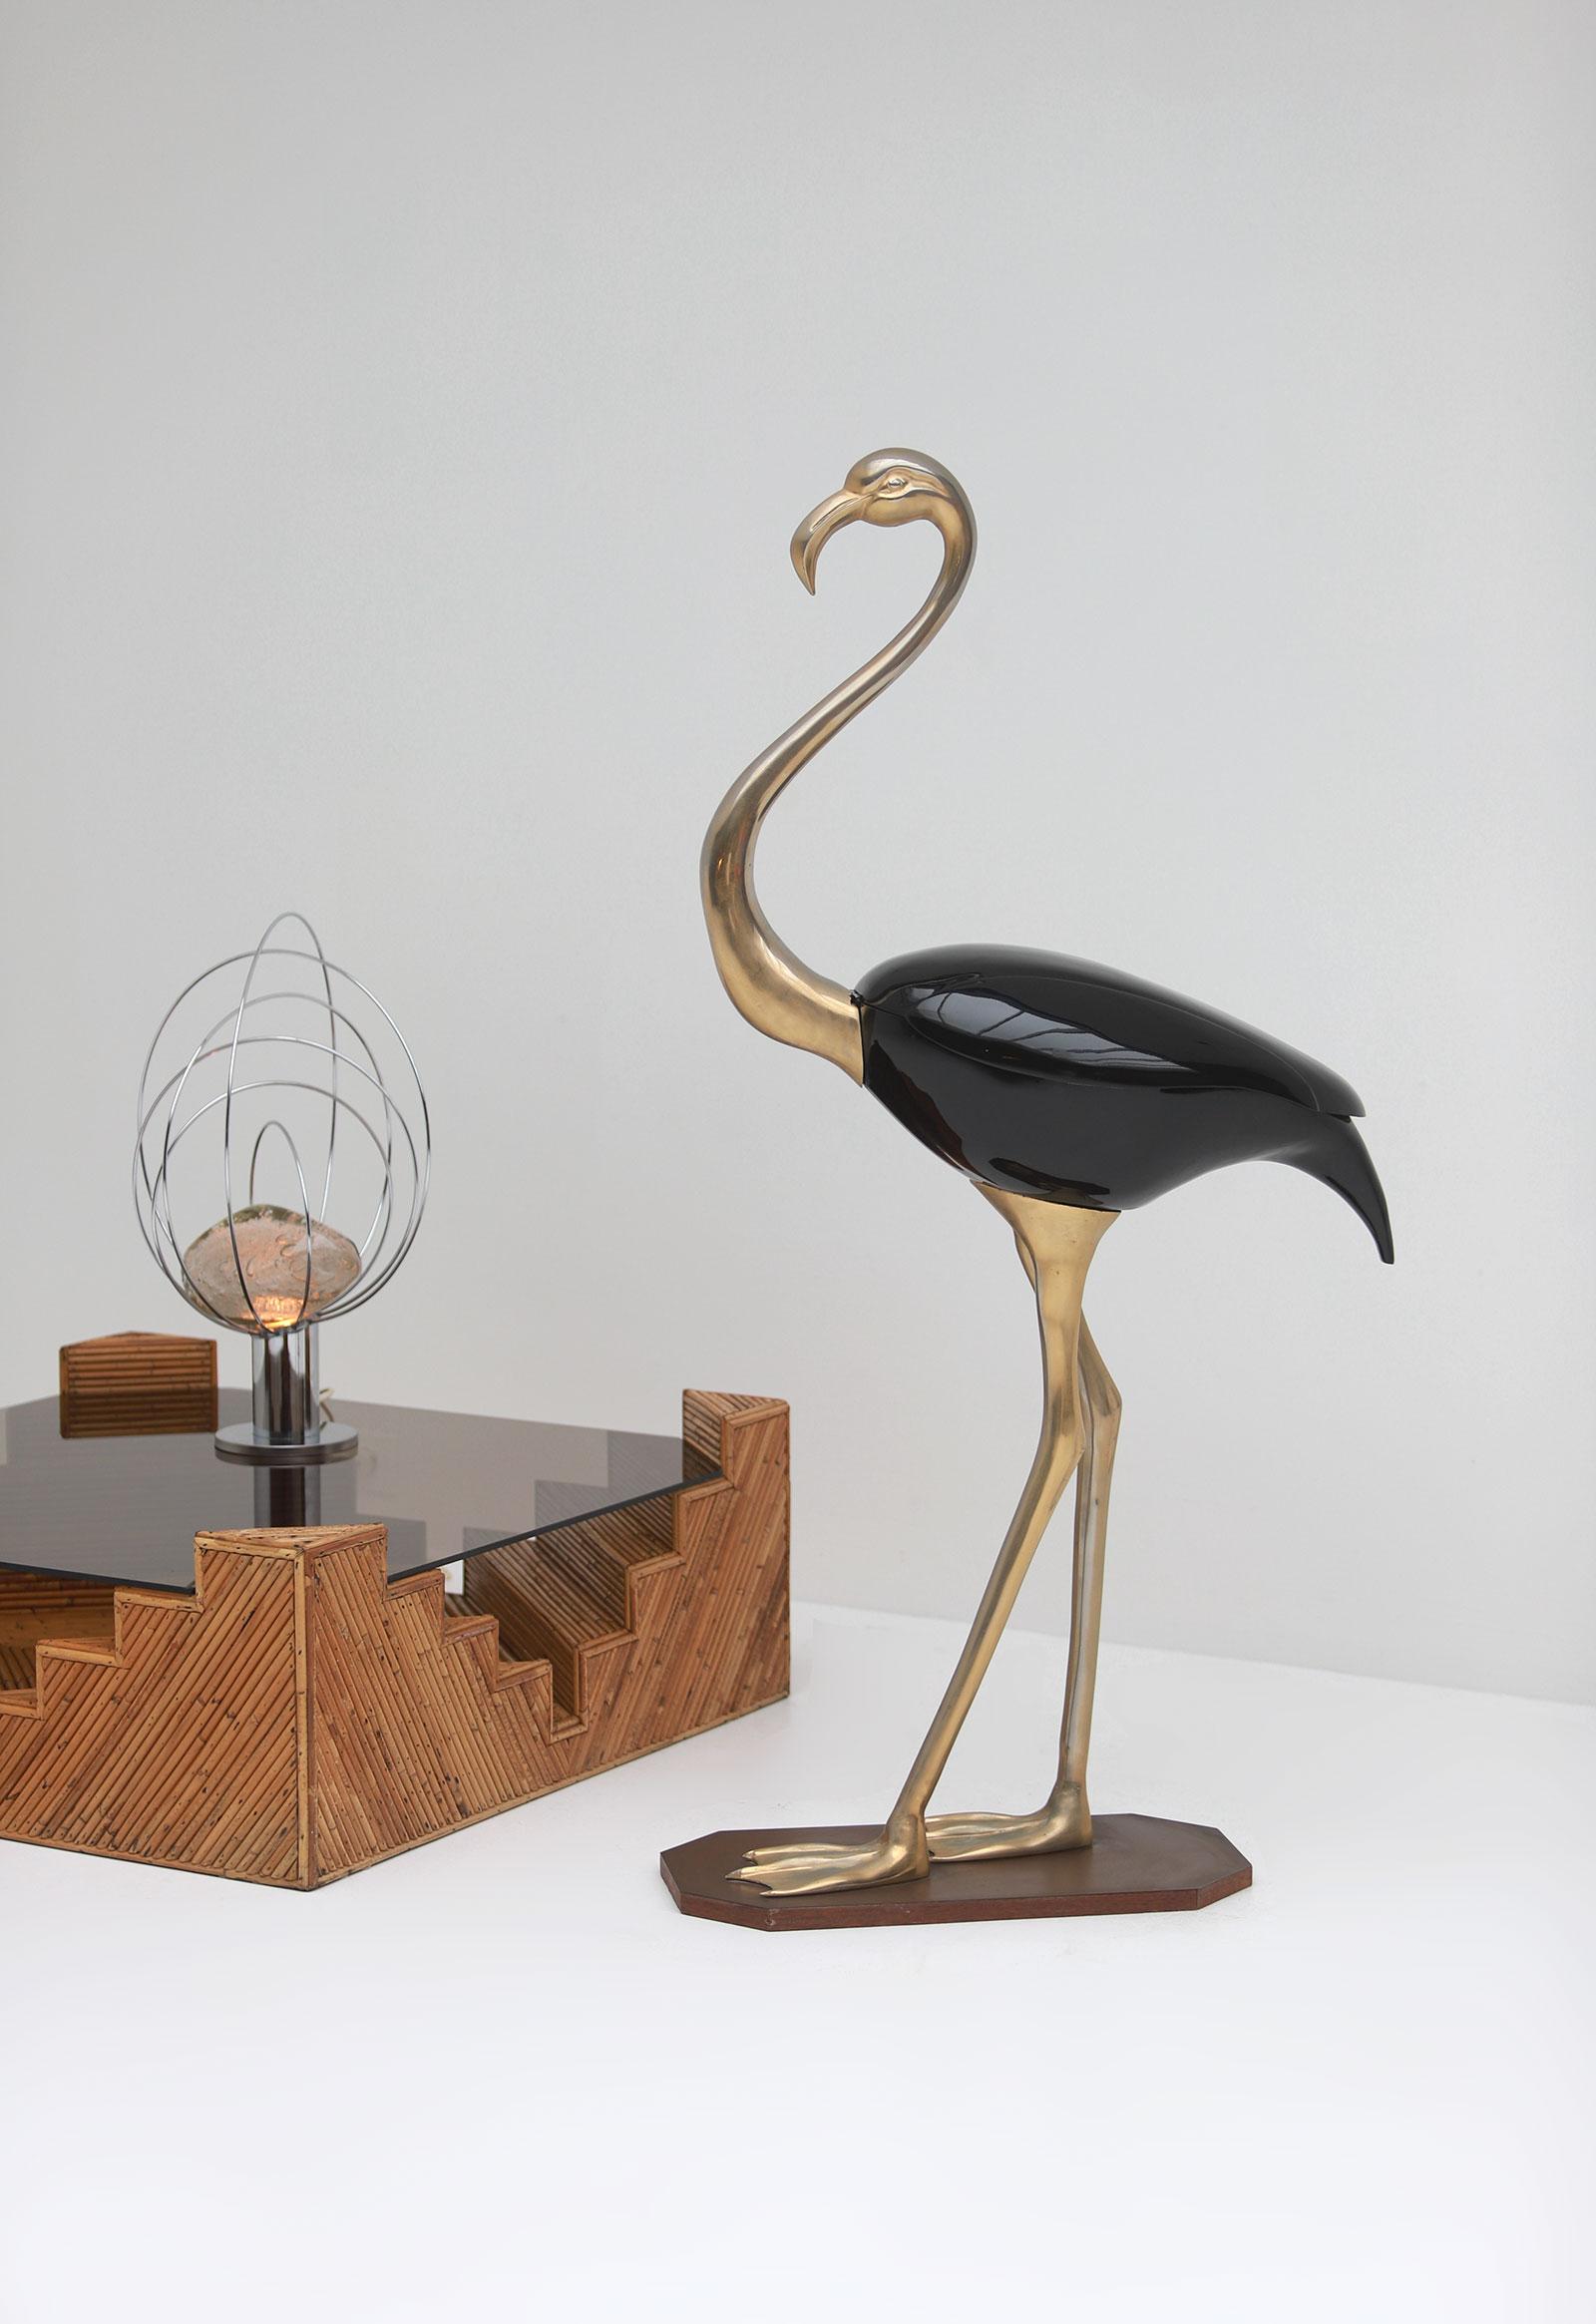 Fondica Lifesize Brass Flamingo 1970simage 9